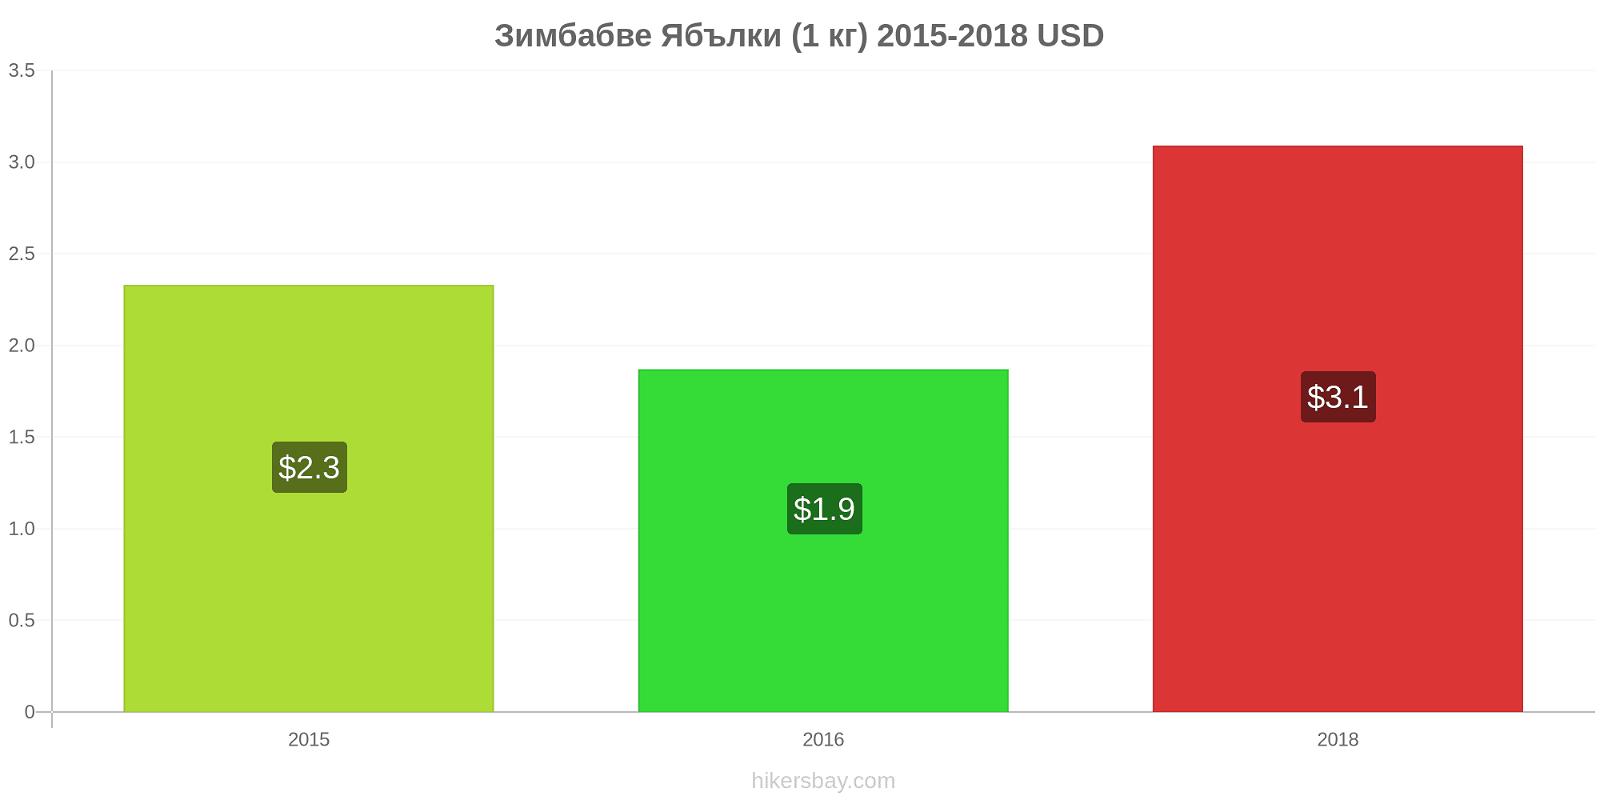 Зимбабве ценови промени Ябълки (1 кг) hikersbay.com